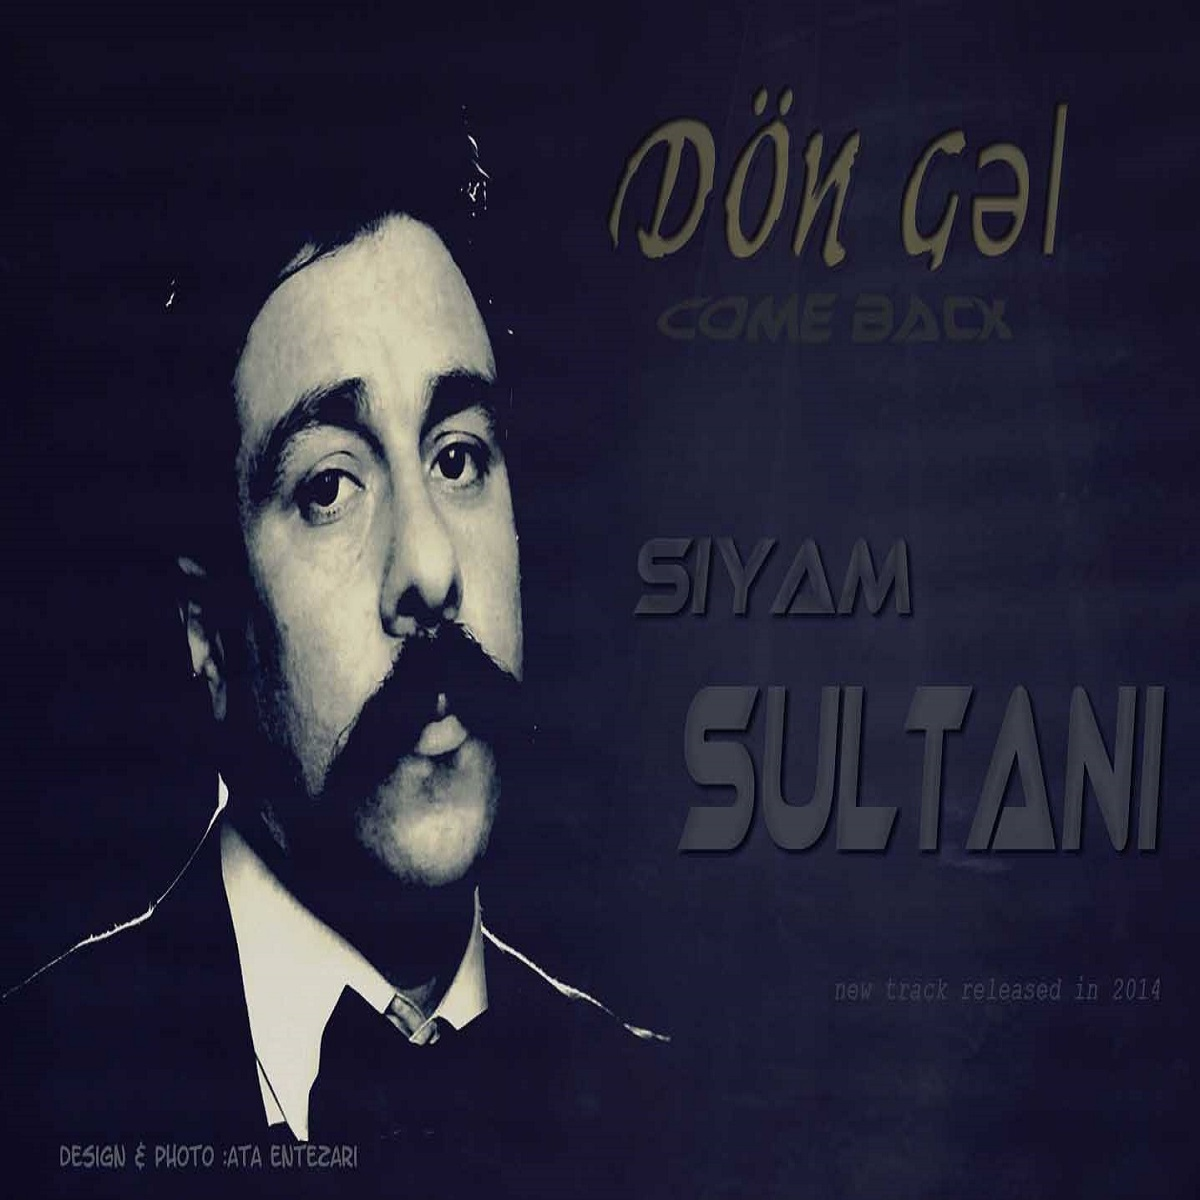 http://s9.picofile.com/file/8326067792/45Siyam_Sultani_Don_Gel.jpg